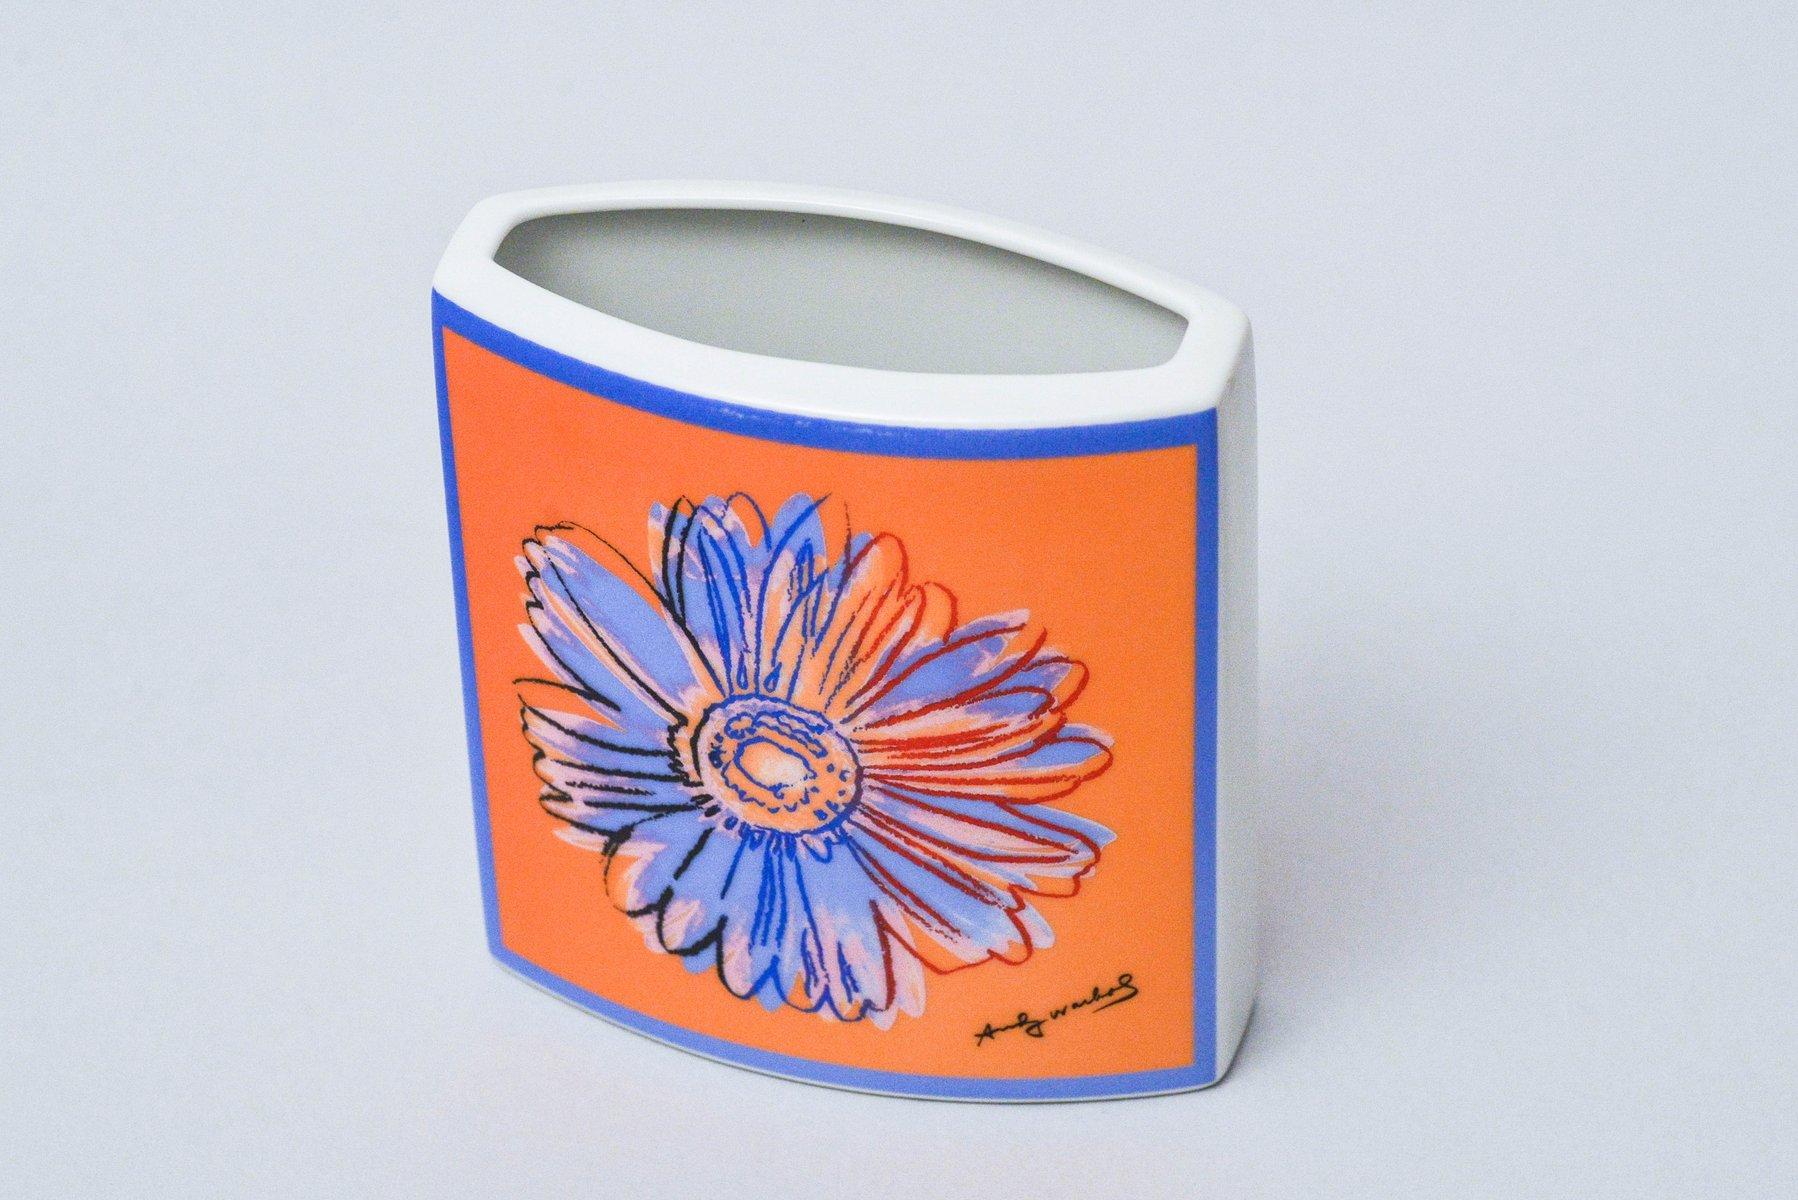 vintage daisy vase von andy warhol f r rosenthal studio line bei pamono kaufen. Black Bedroom Furniture Sets. Home Design Ideas